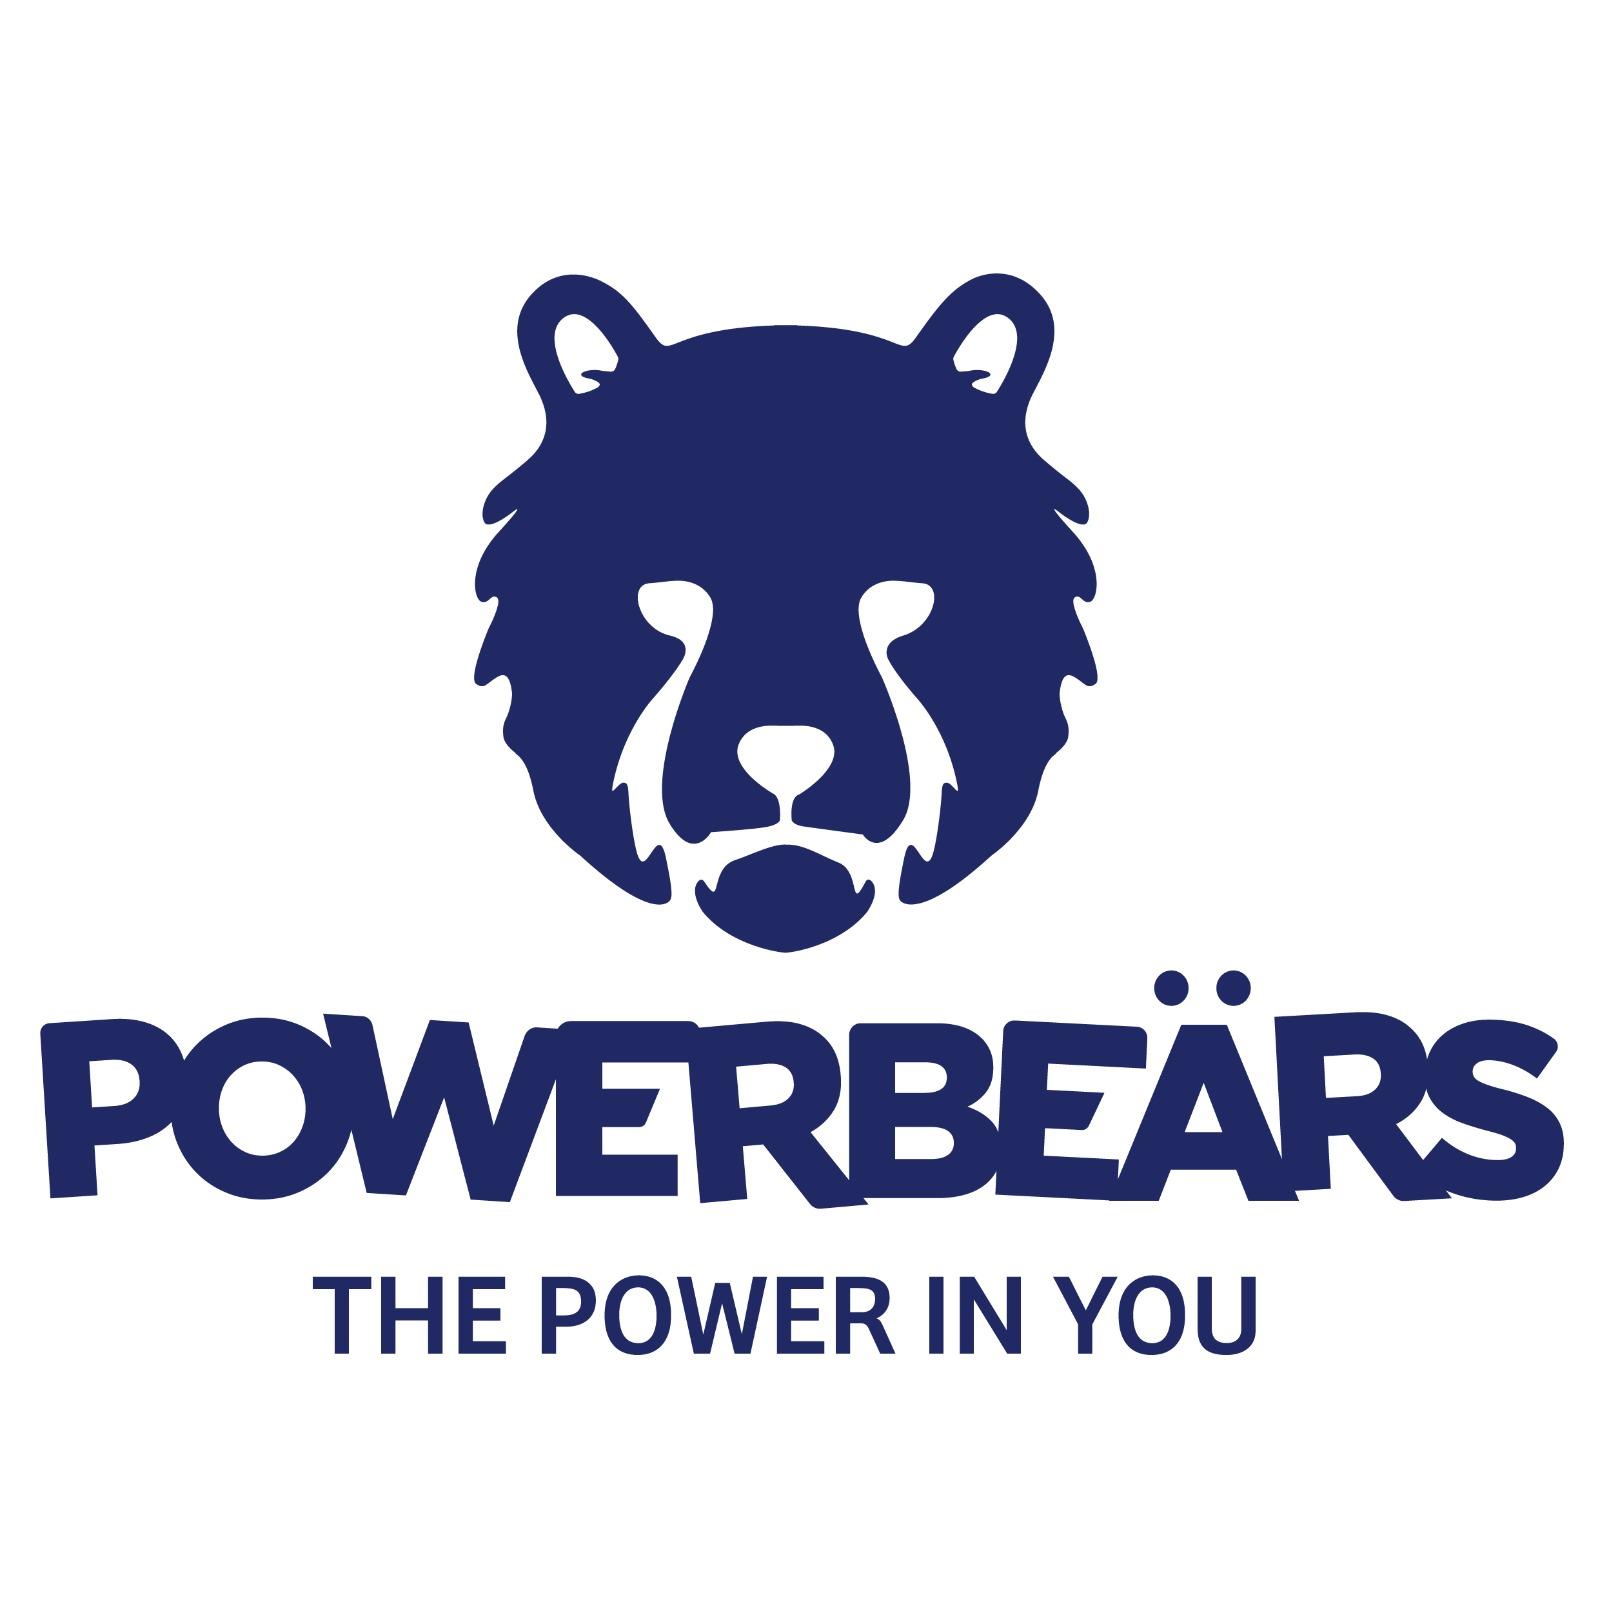 Powerbears